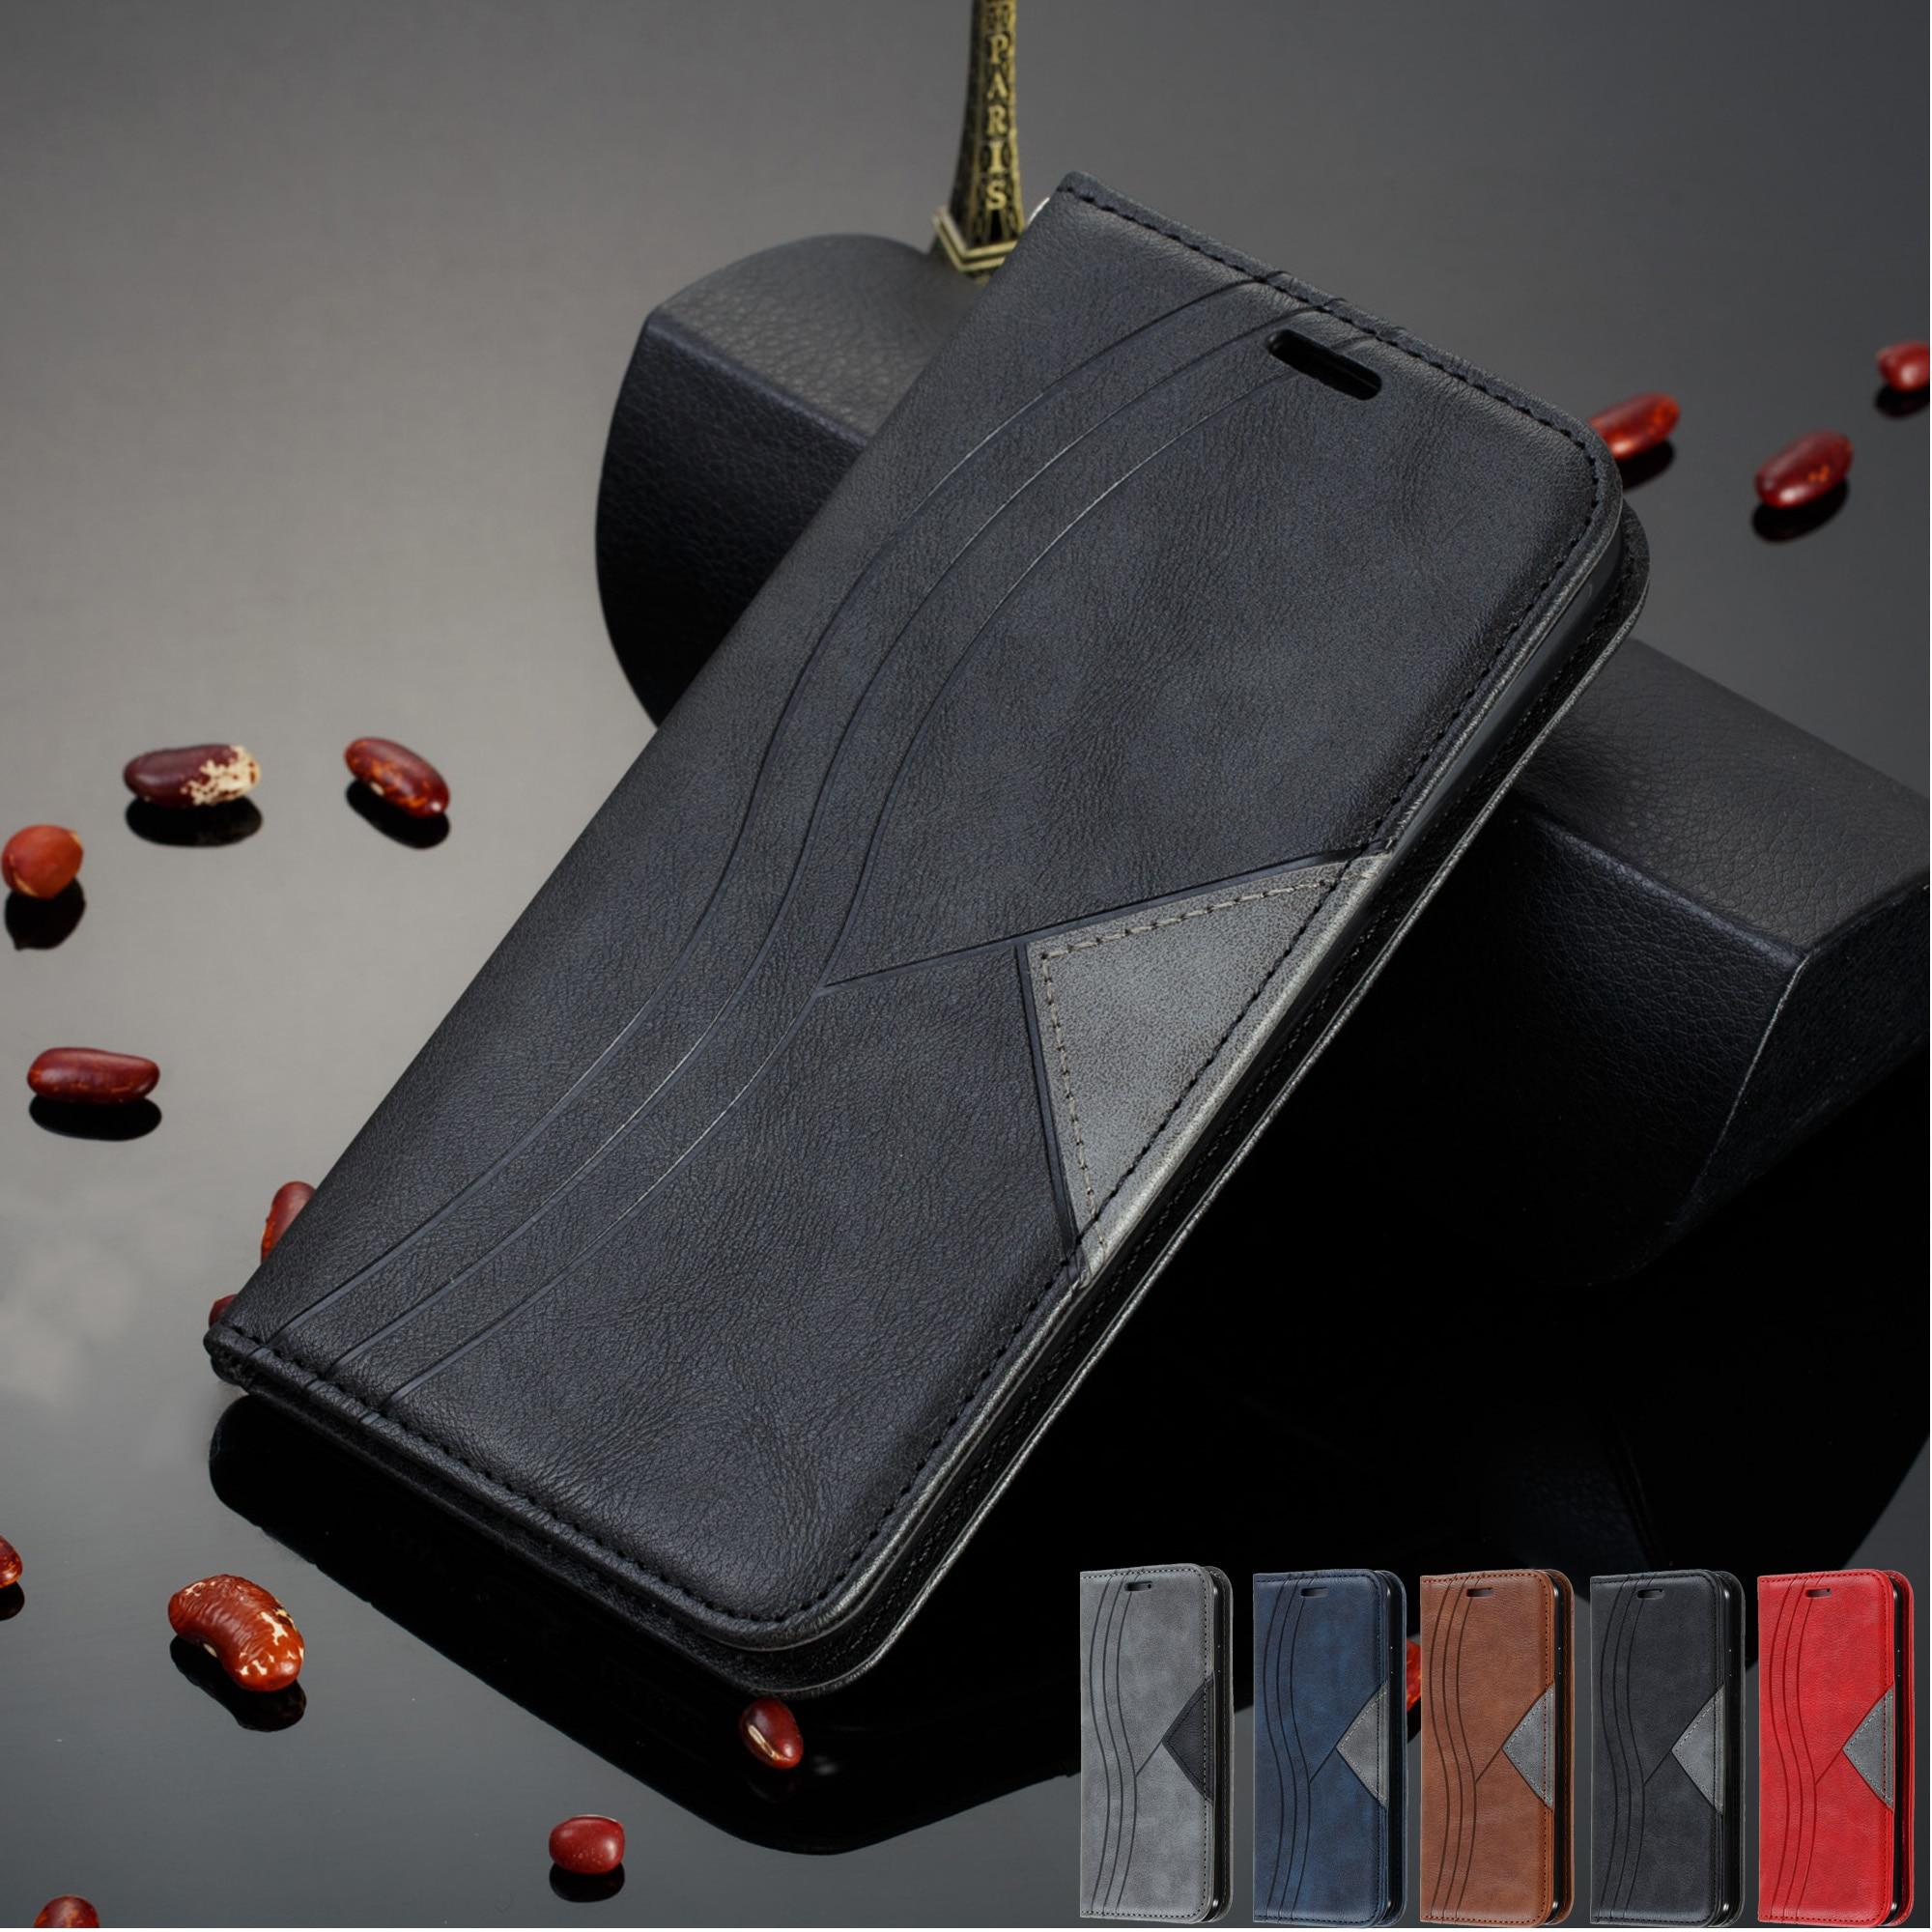 Capa redmi Nota 8 caso para Xiaomi redmi Note8 T 8 7Pro 8pro casos xiomi redmi 8A redmi 8 redmi 8A 7A 6A imán, de piel con tapa coque